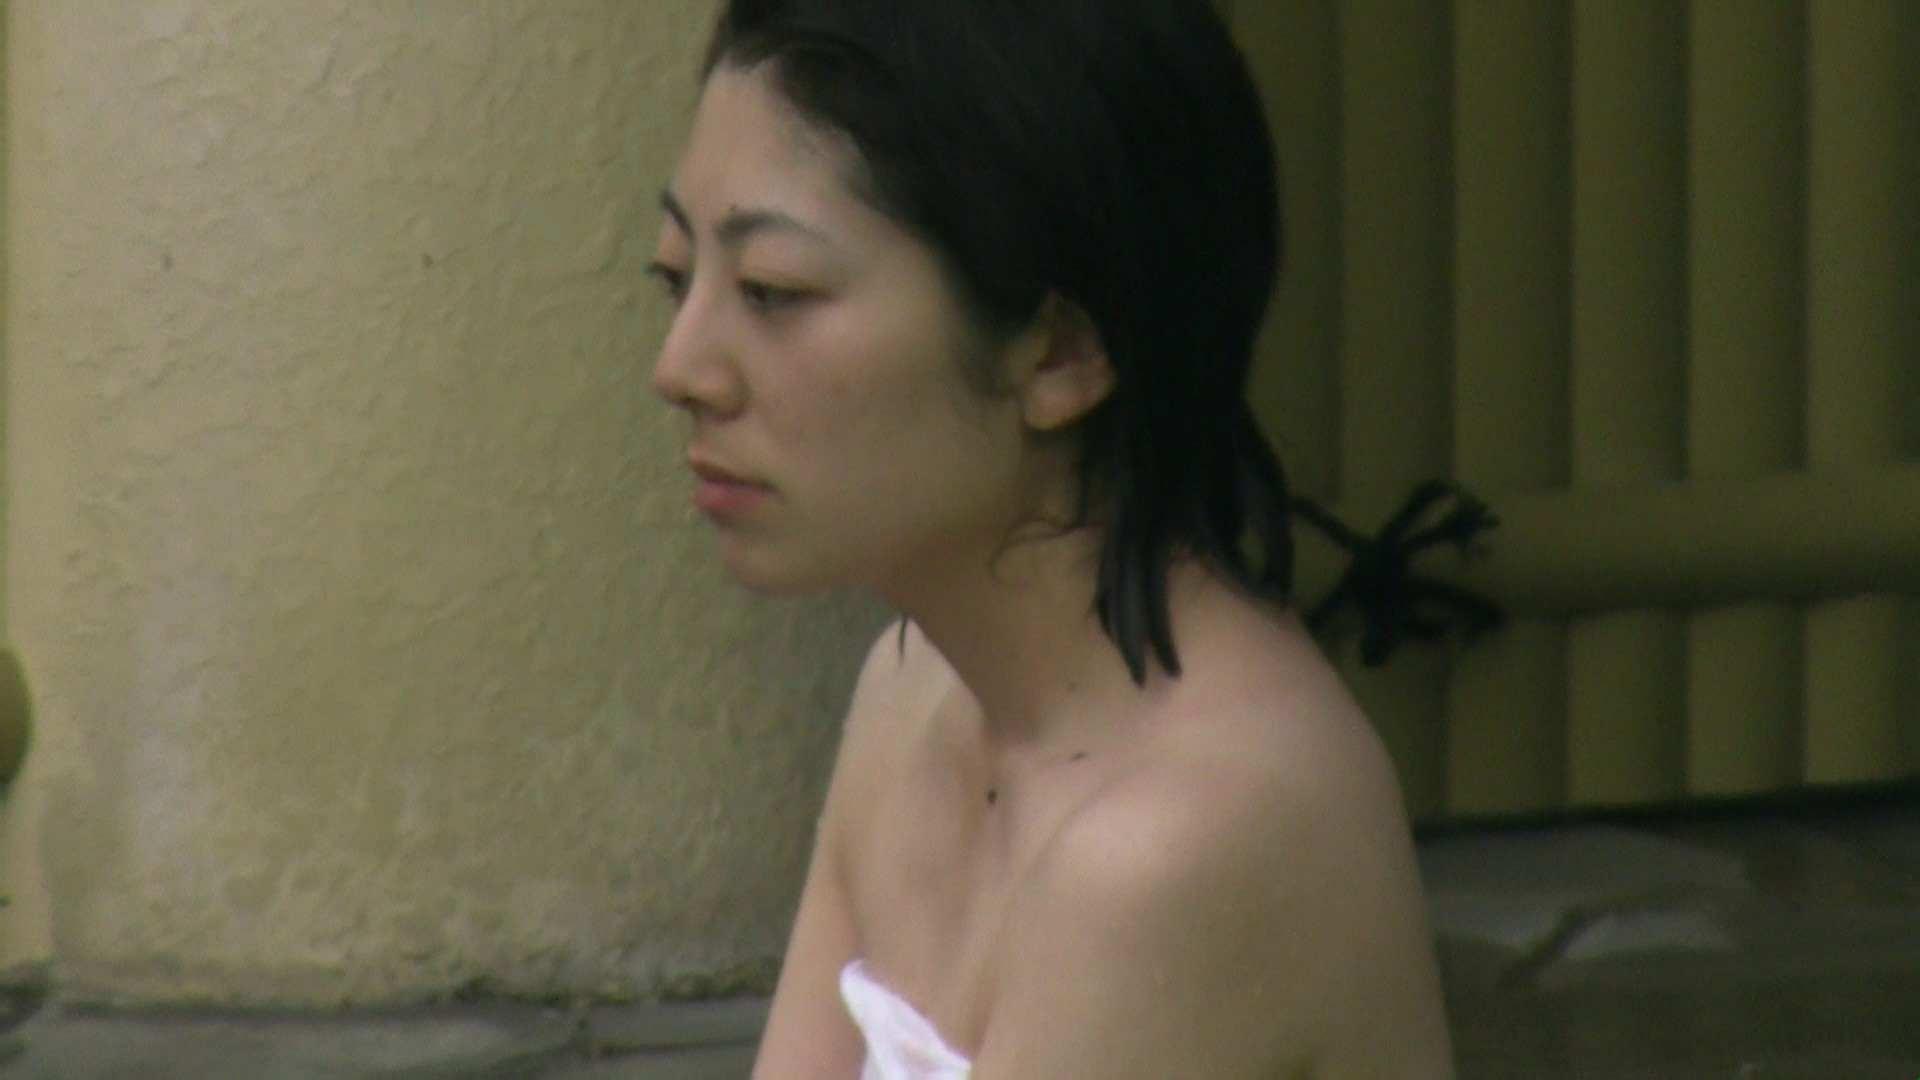 Aquaな露天風呂Vol.04 露天 オメコ無修正動画無料 84pic 39